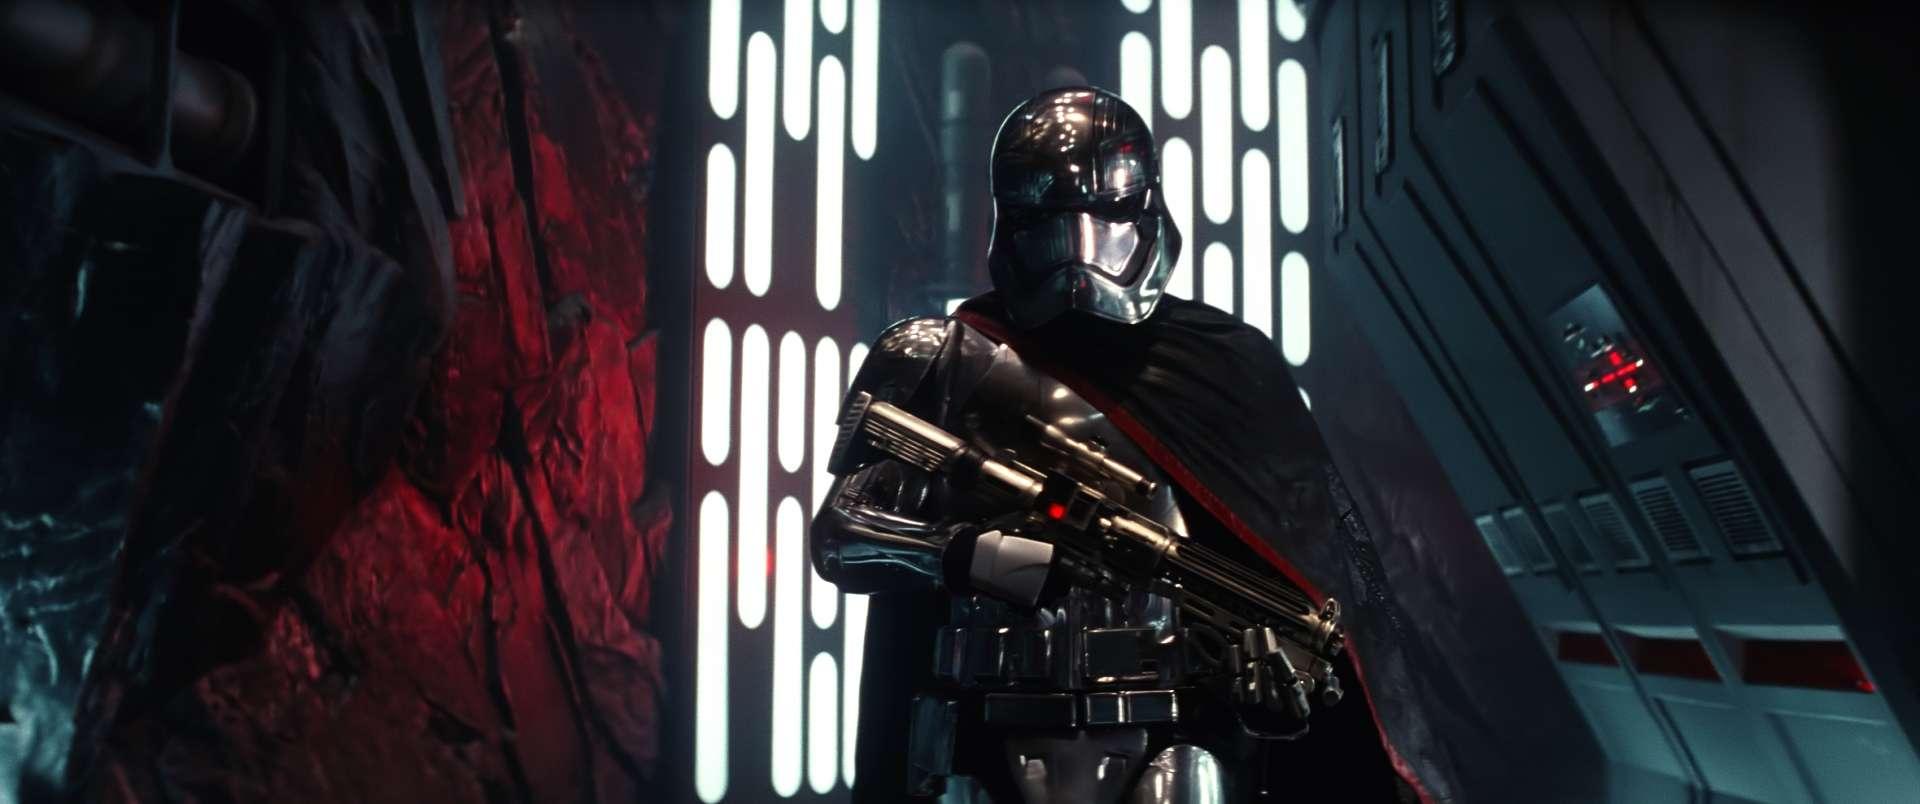 Star Wars Episode VII The Force Awakens Wallpaper 011